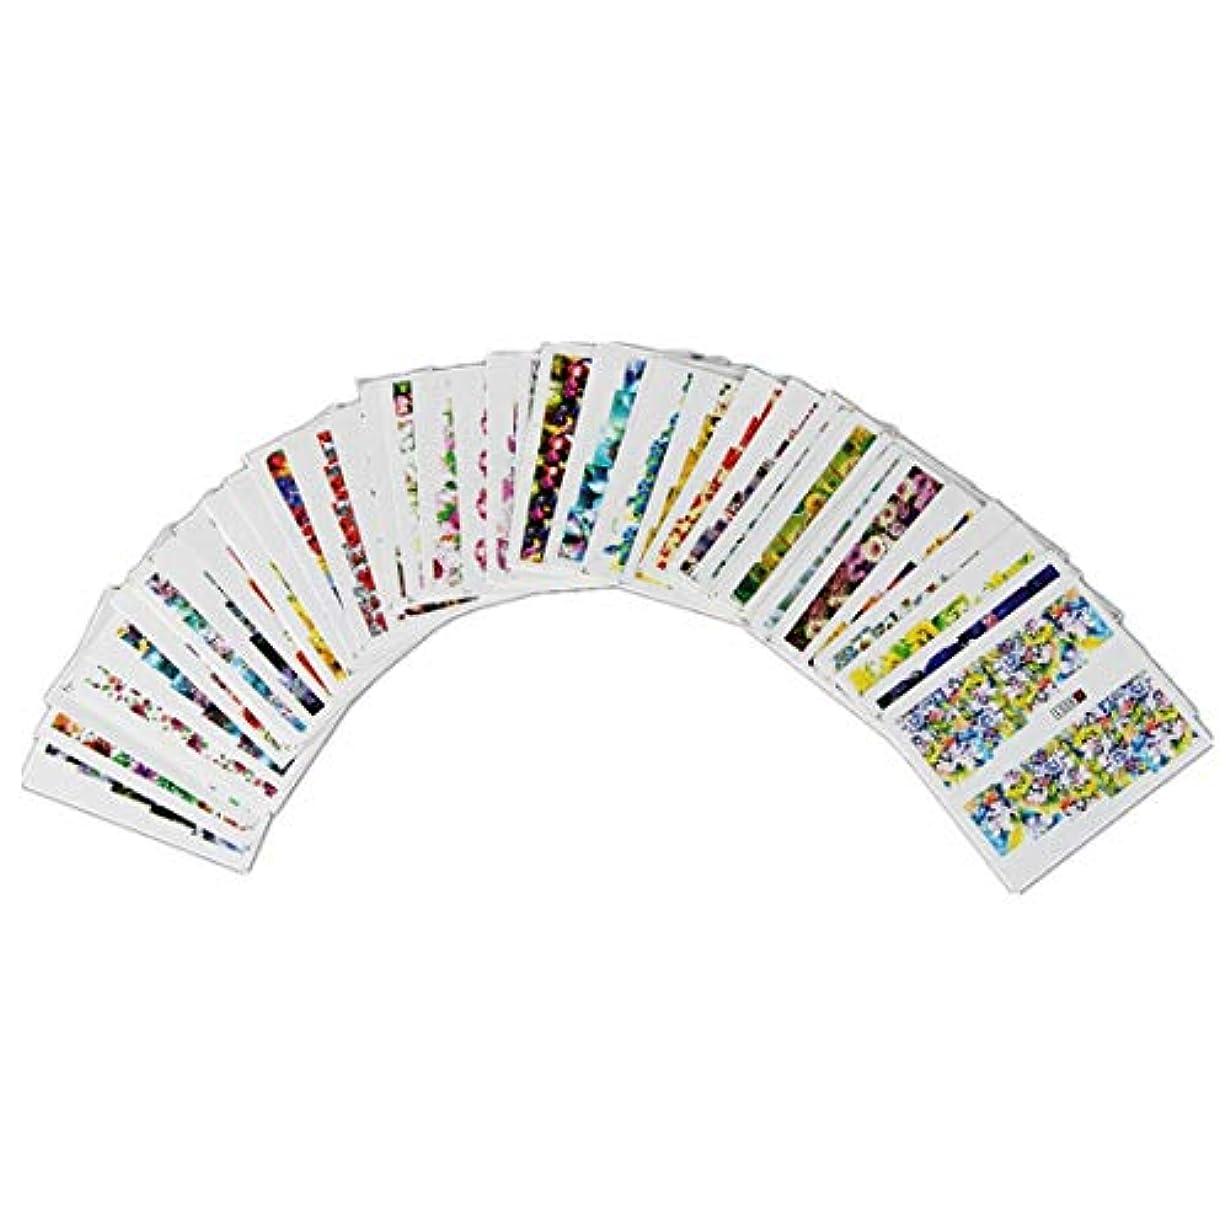 ALEXBIAN 50枚ネイルステッカー盛り合わせパターン水転写花フラワーステッカーセット女性用爪の装飾ネイルデカールネイルアートアクセサリーマニキュアチャームヒント